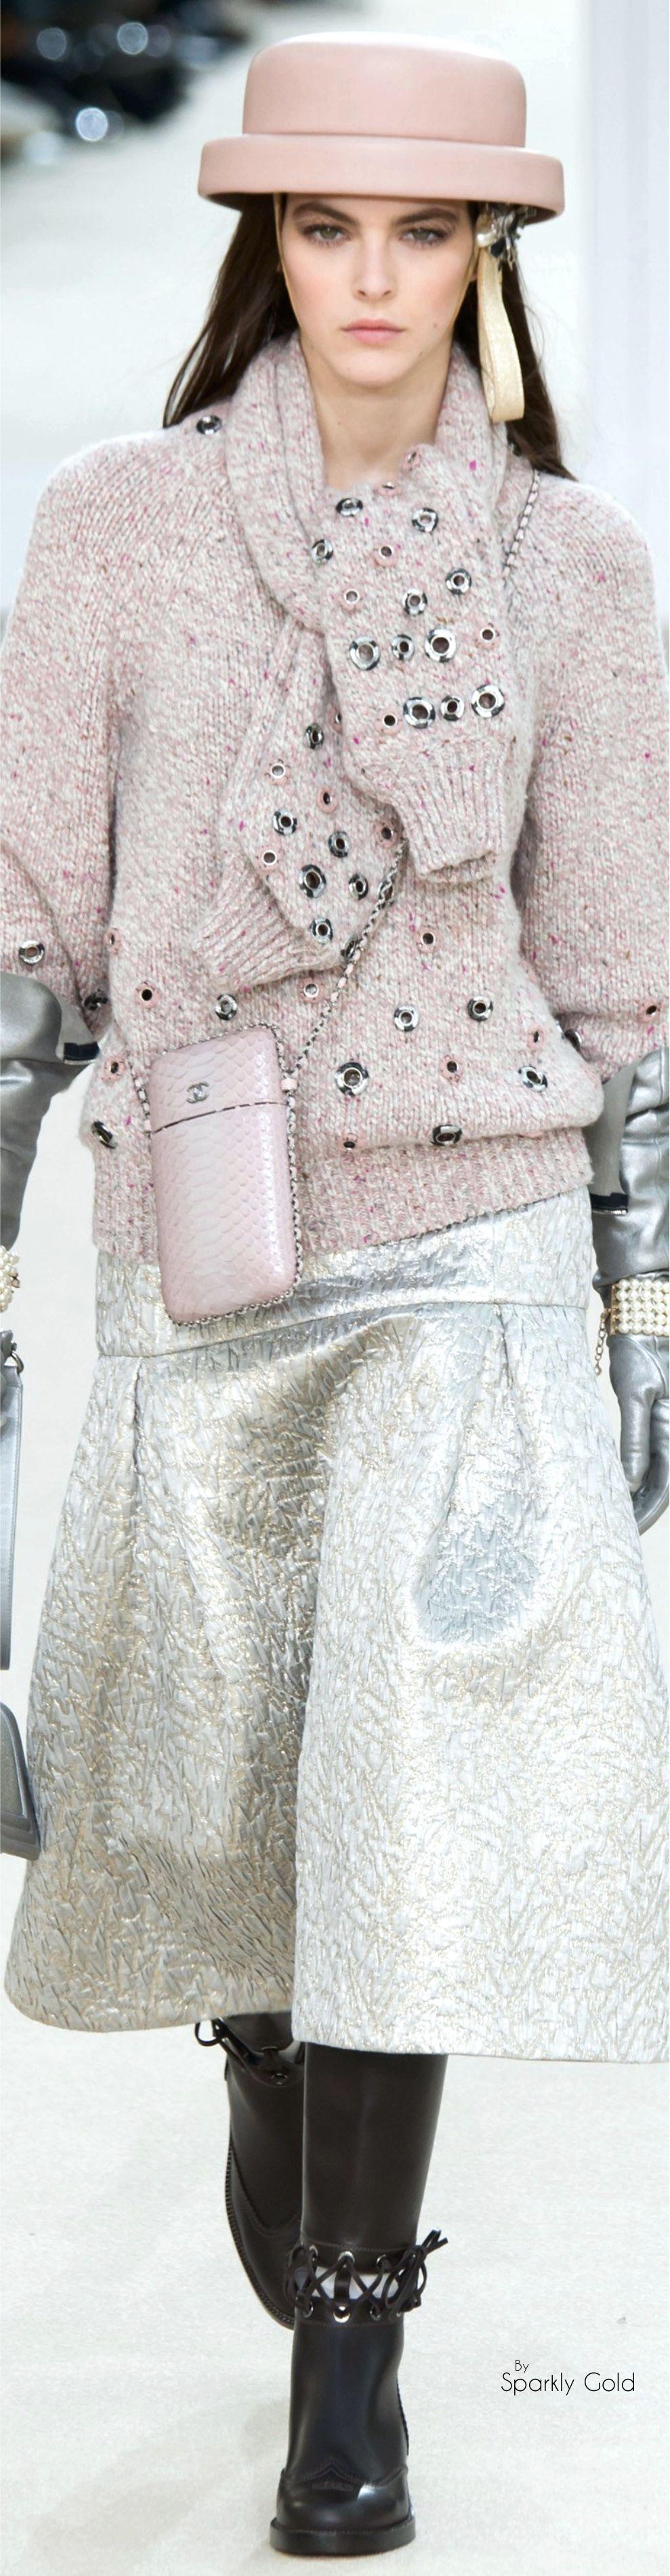 Chanel prêt-à-porter automne-hiver 2016-17 #Chanel #ChanelFallWinter2017 |espridegabrielle.com #espritdegabrielle